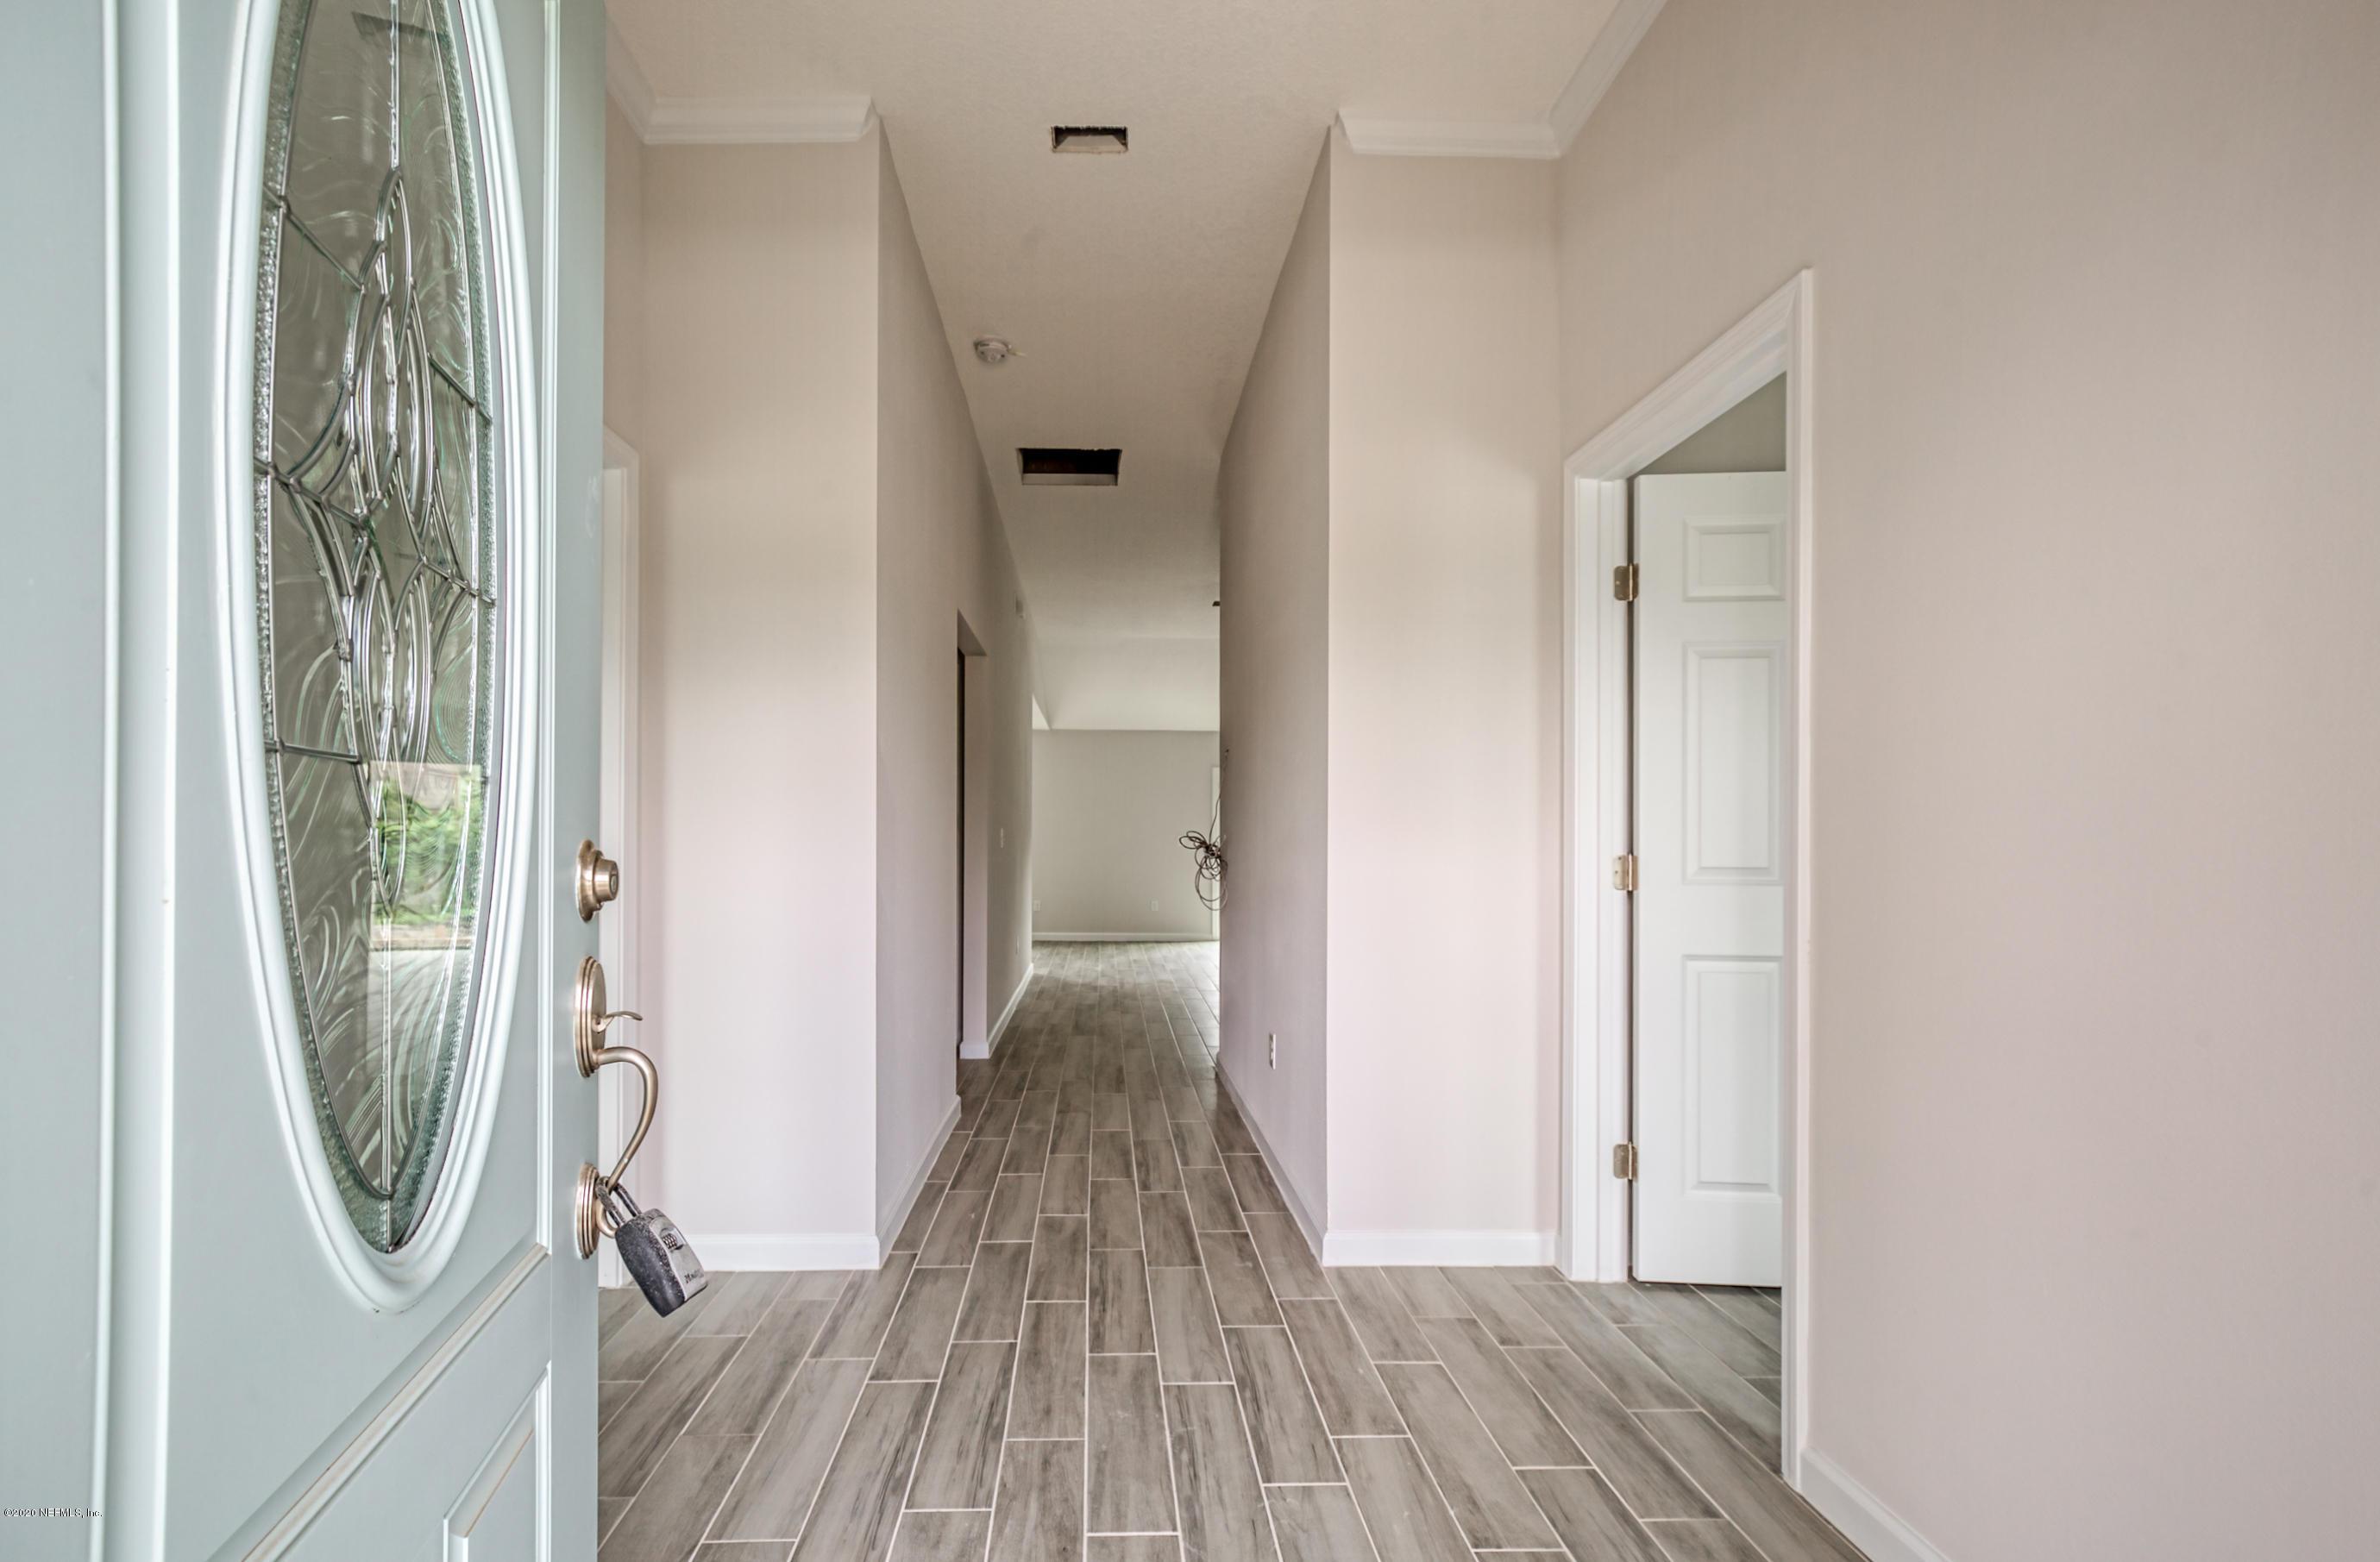 6075 PATRIOT'S LANDING, JACKSONVILLE, FLORIDA 32244, 4 Bedrooms Bedrooms, ,2 BathroomsBathrooms,Residential,For sale,PATRIOT'S LANDING,1079898